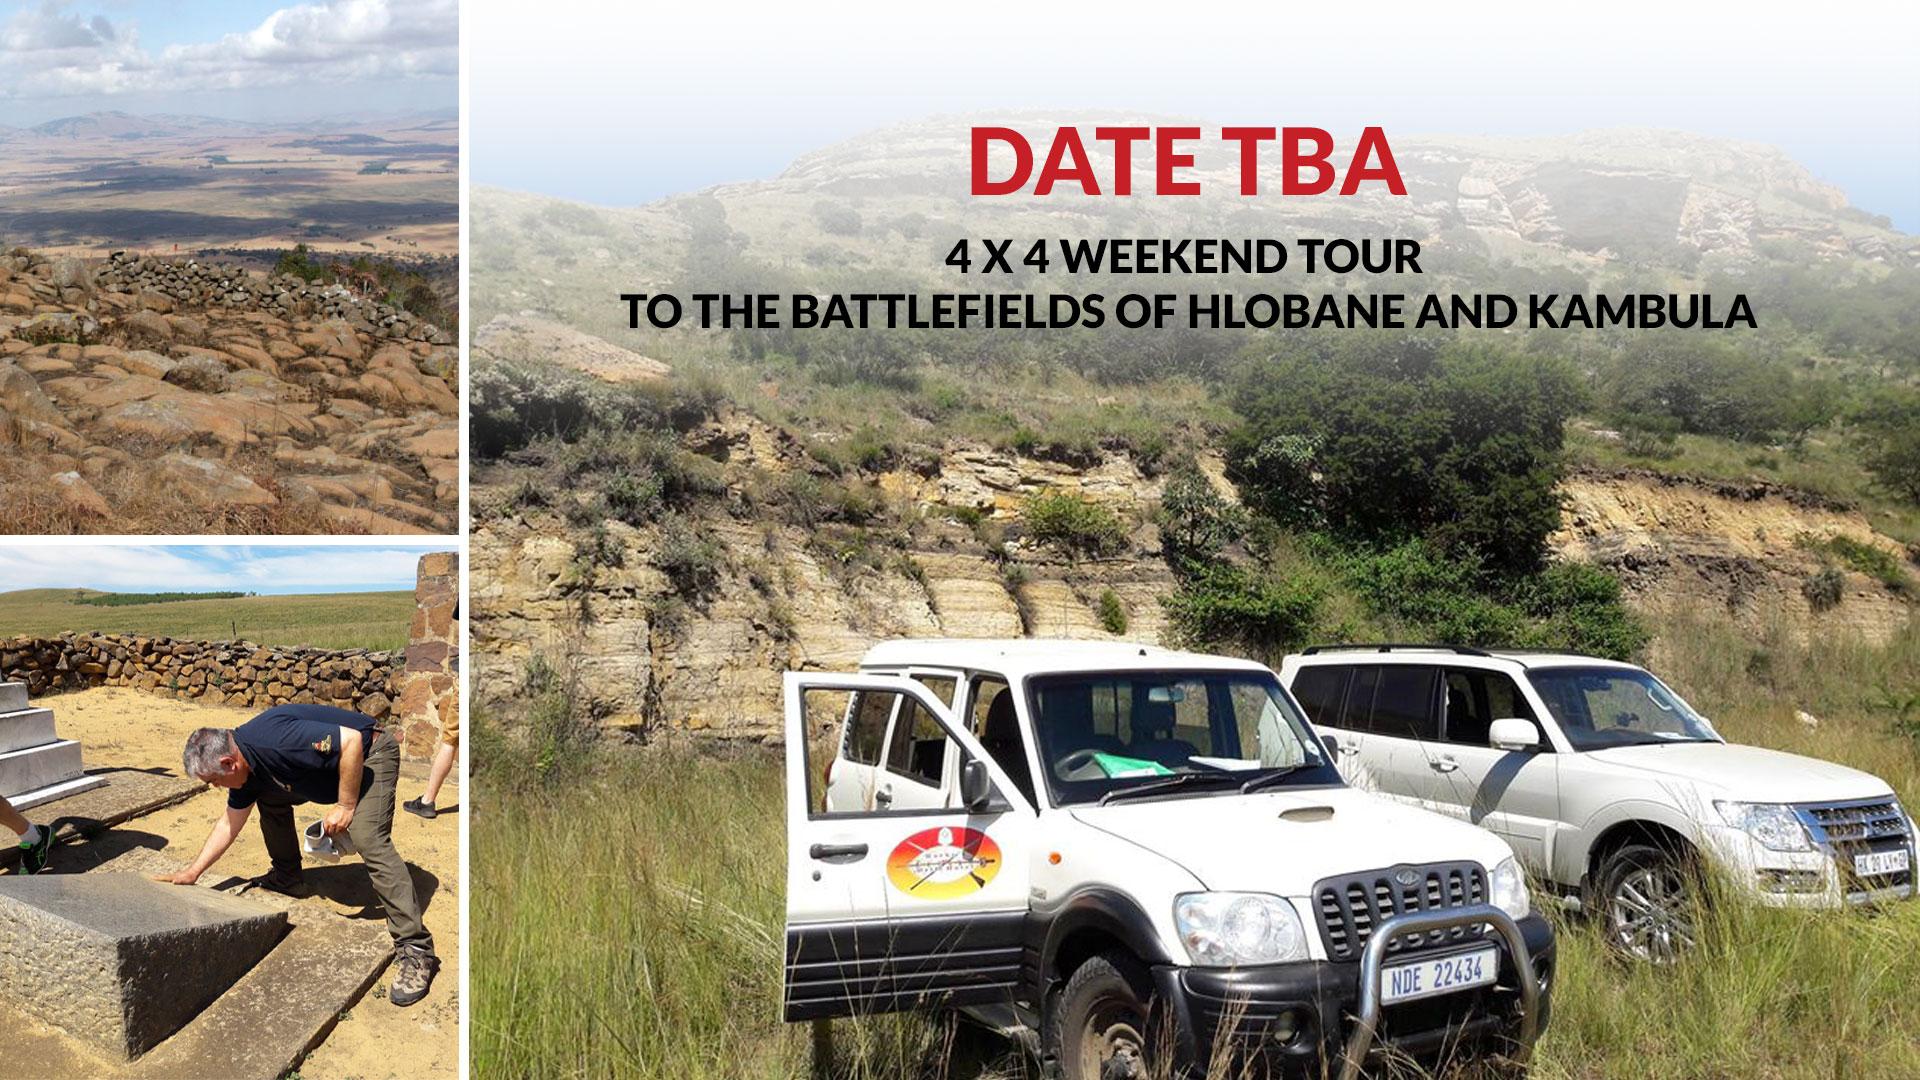 4 x 4 weekend tour to the battlefields of Hlobane and Kambula